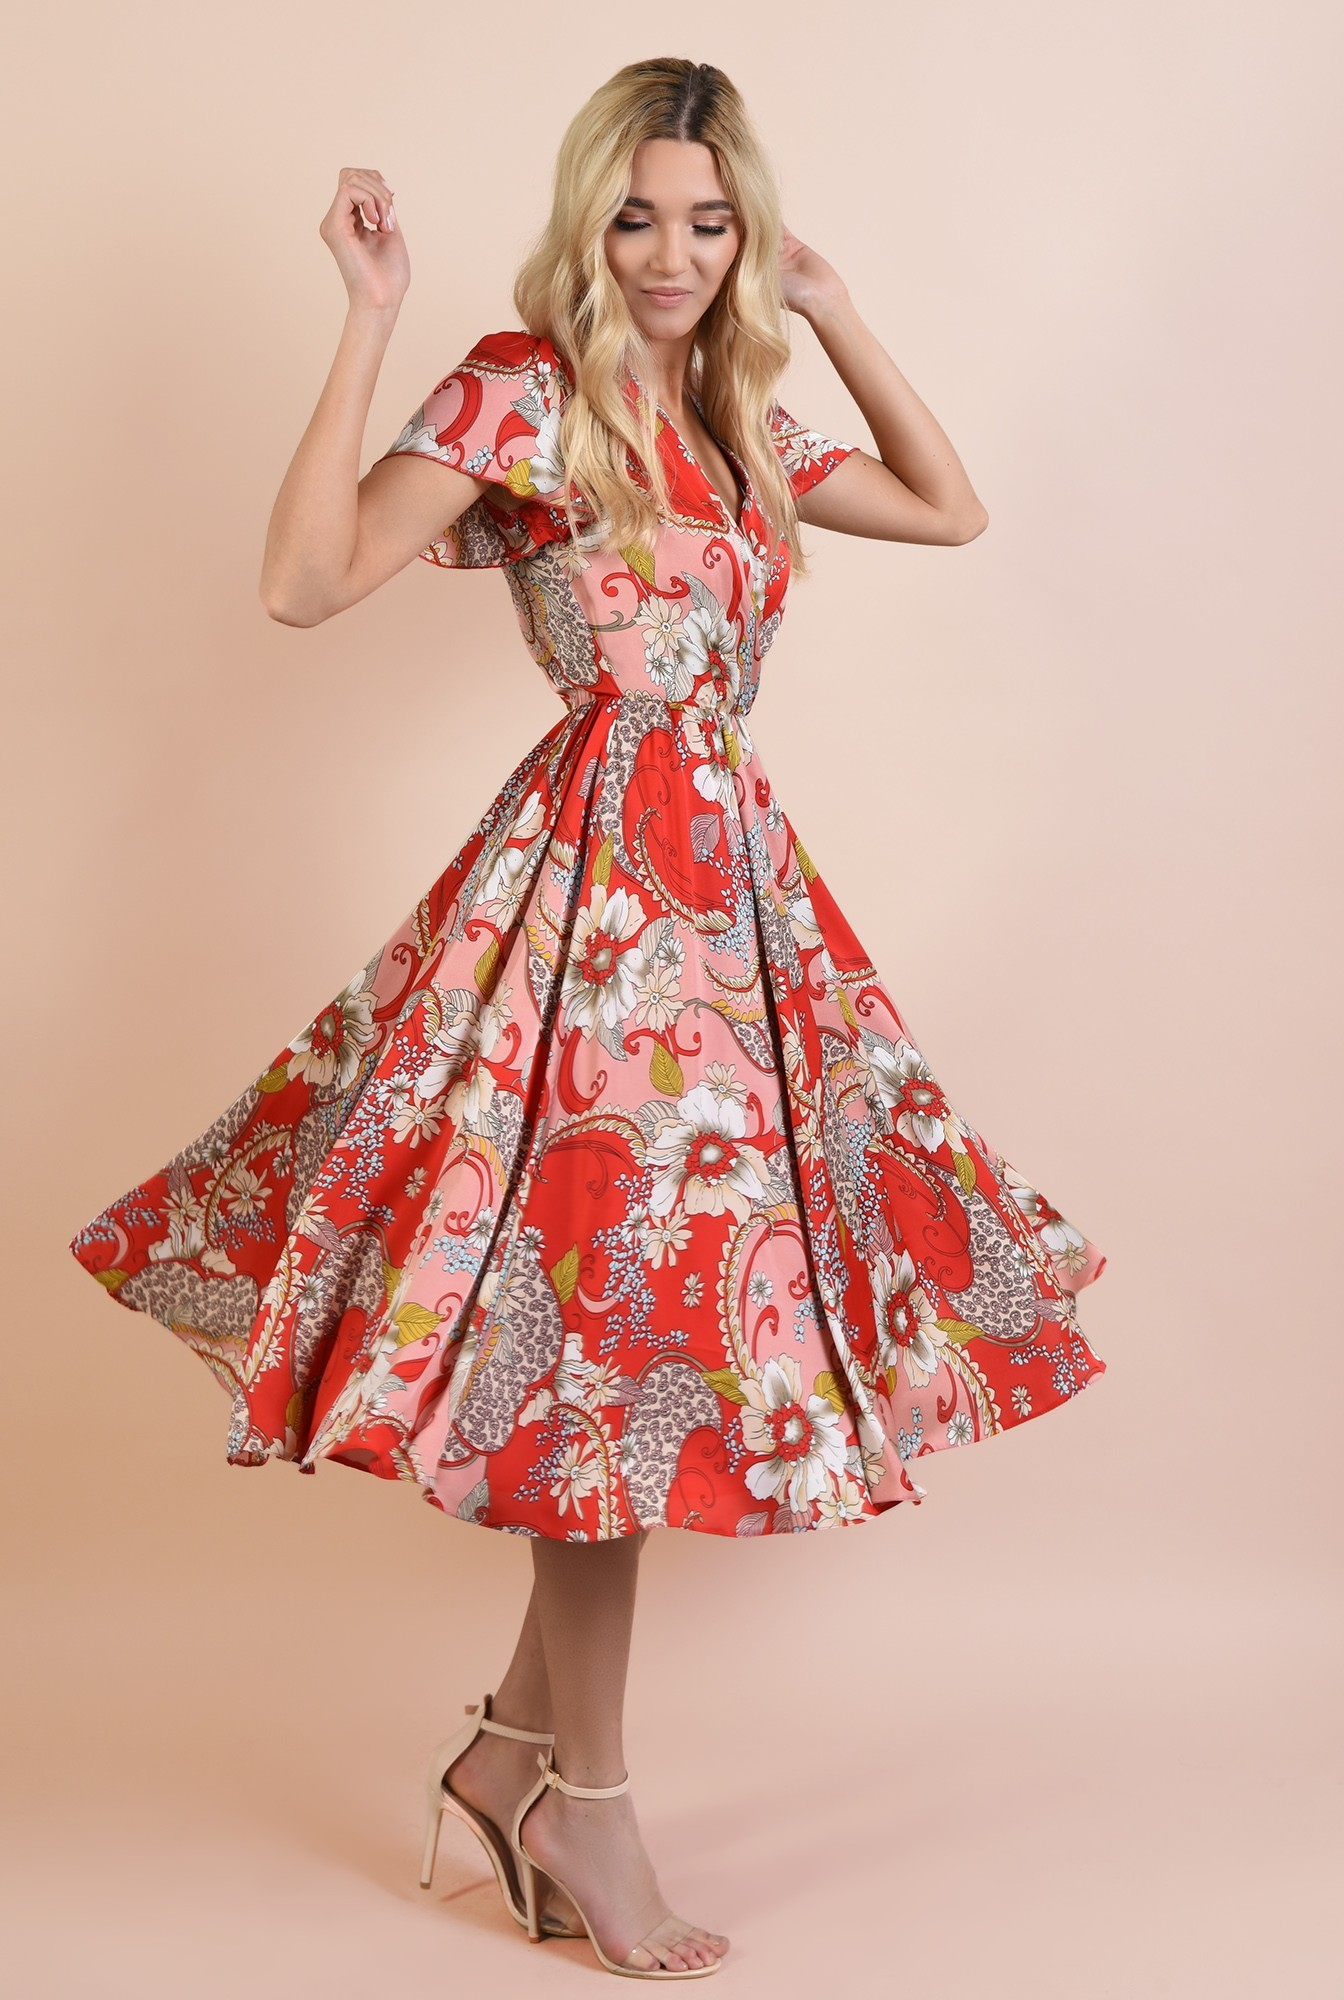 0 - rochie de seara, Poema, cu imprimeu floral, cu maneci fluture, clos